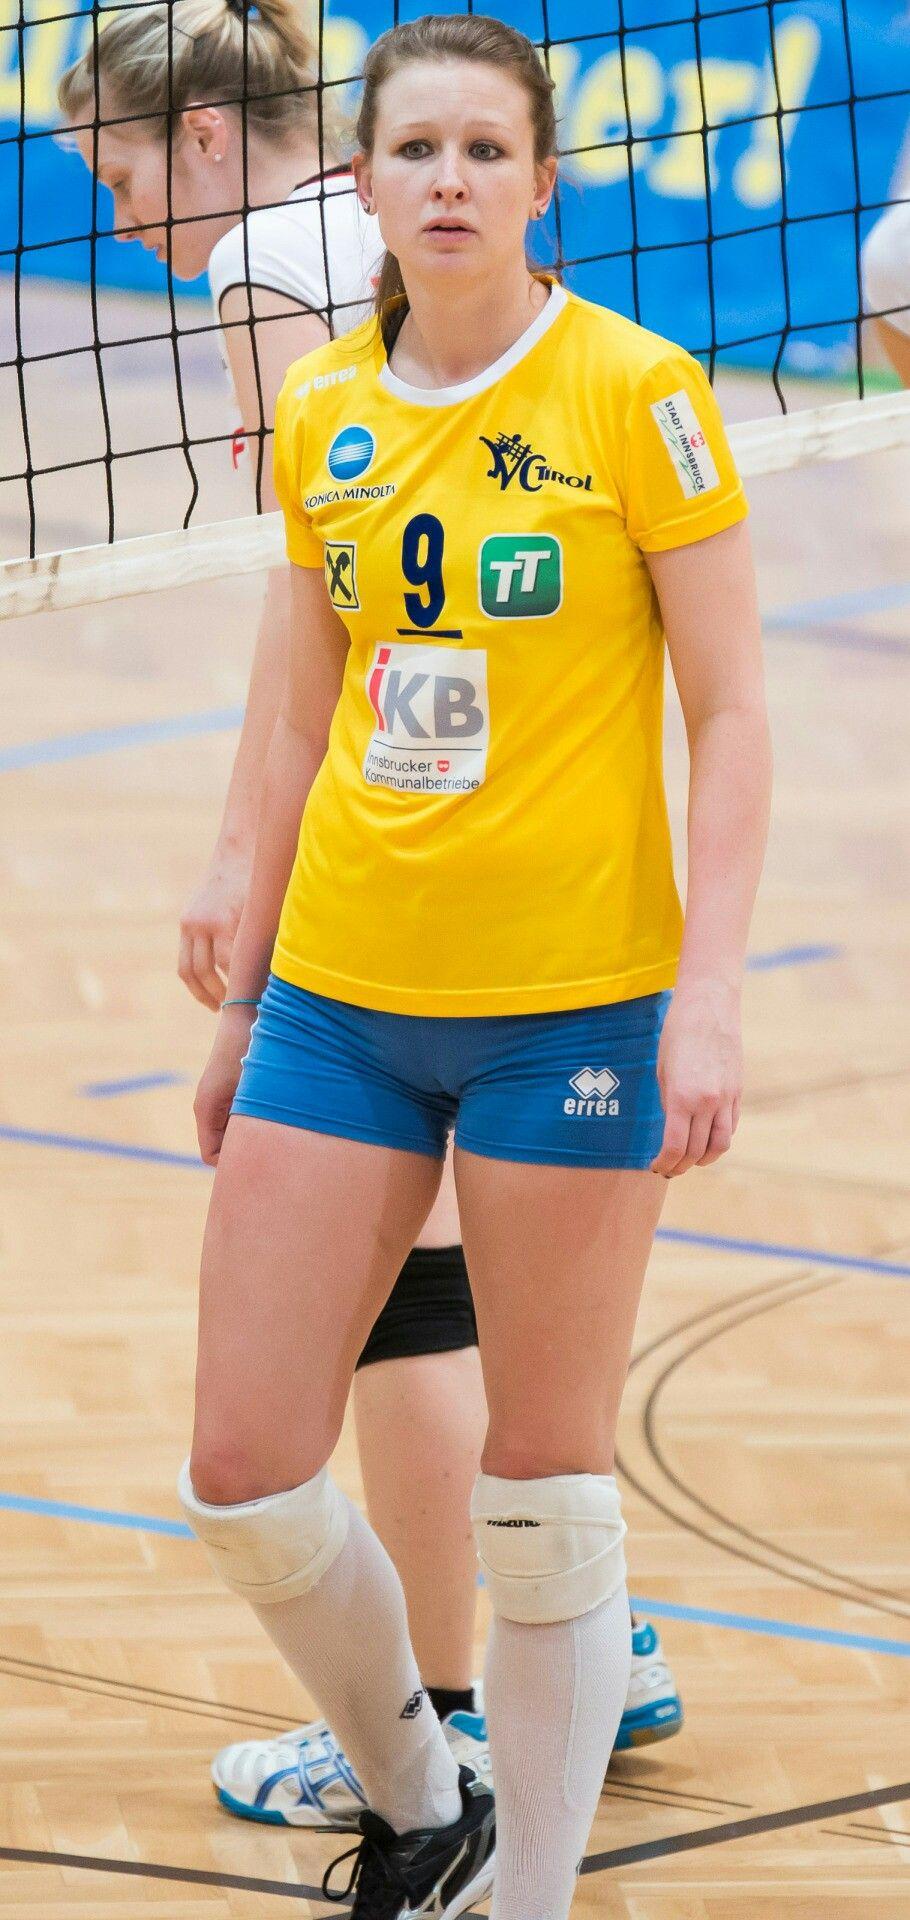 Girls volleyball cameltoe